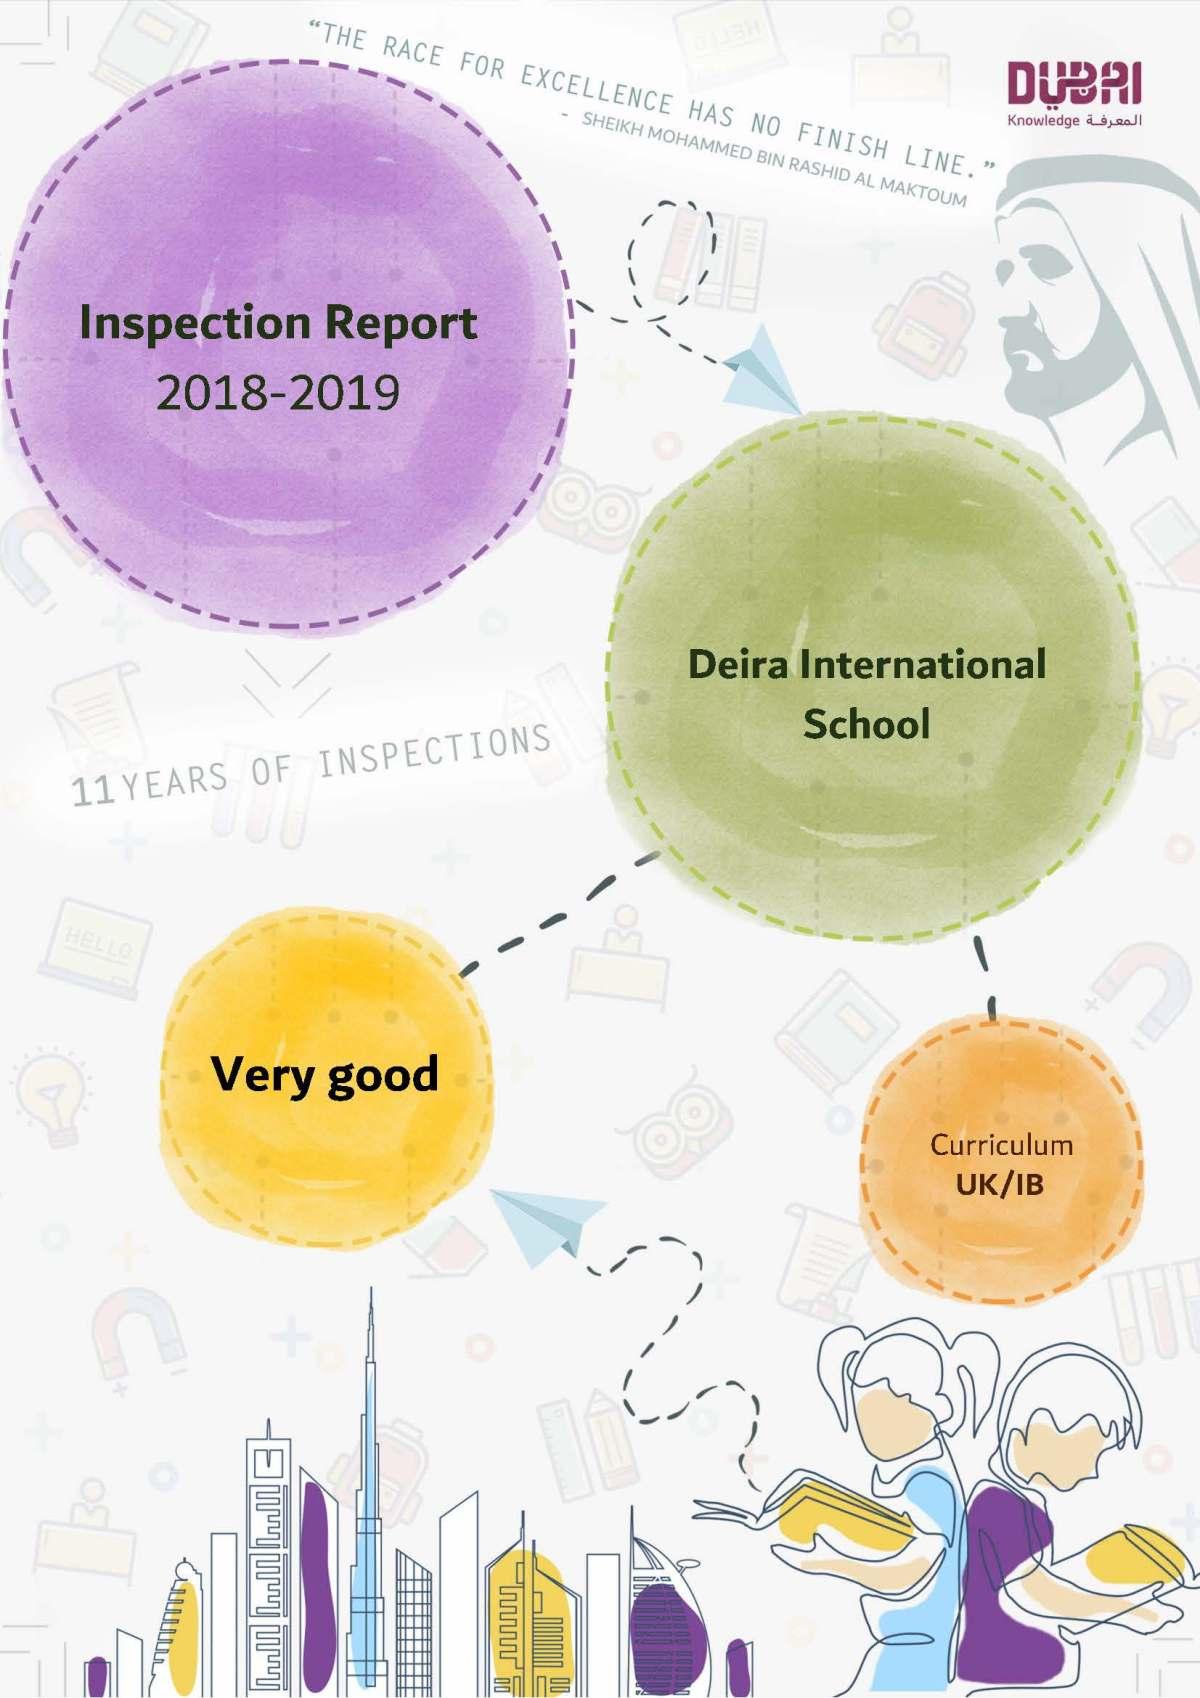 Deira International School.English Draft Report.05 February 2019 (00000002)_Page_01